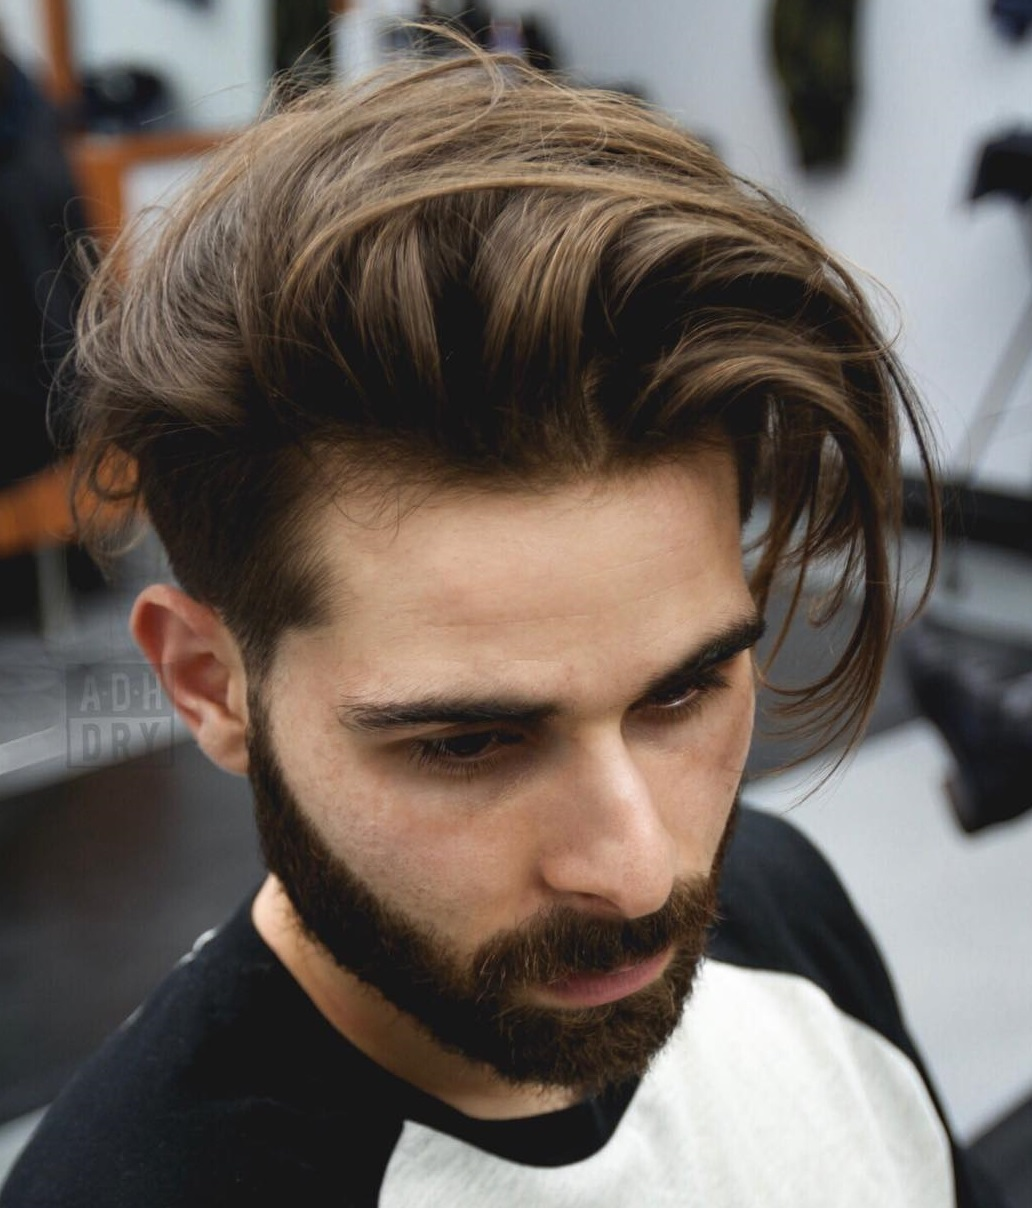 undercut hairstyle long hair